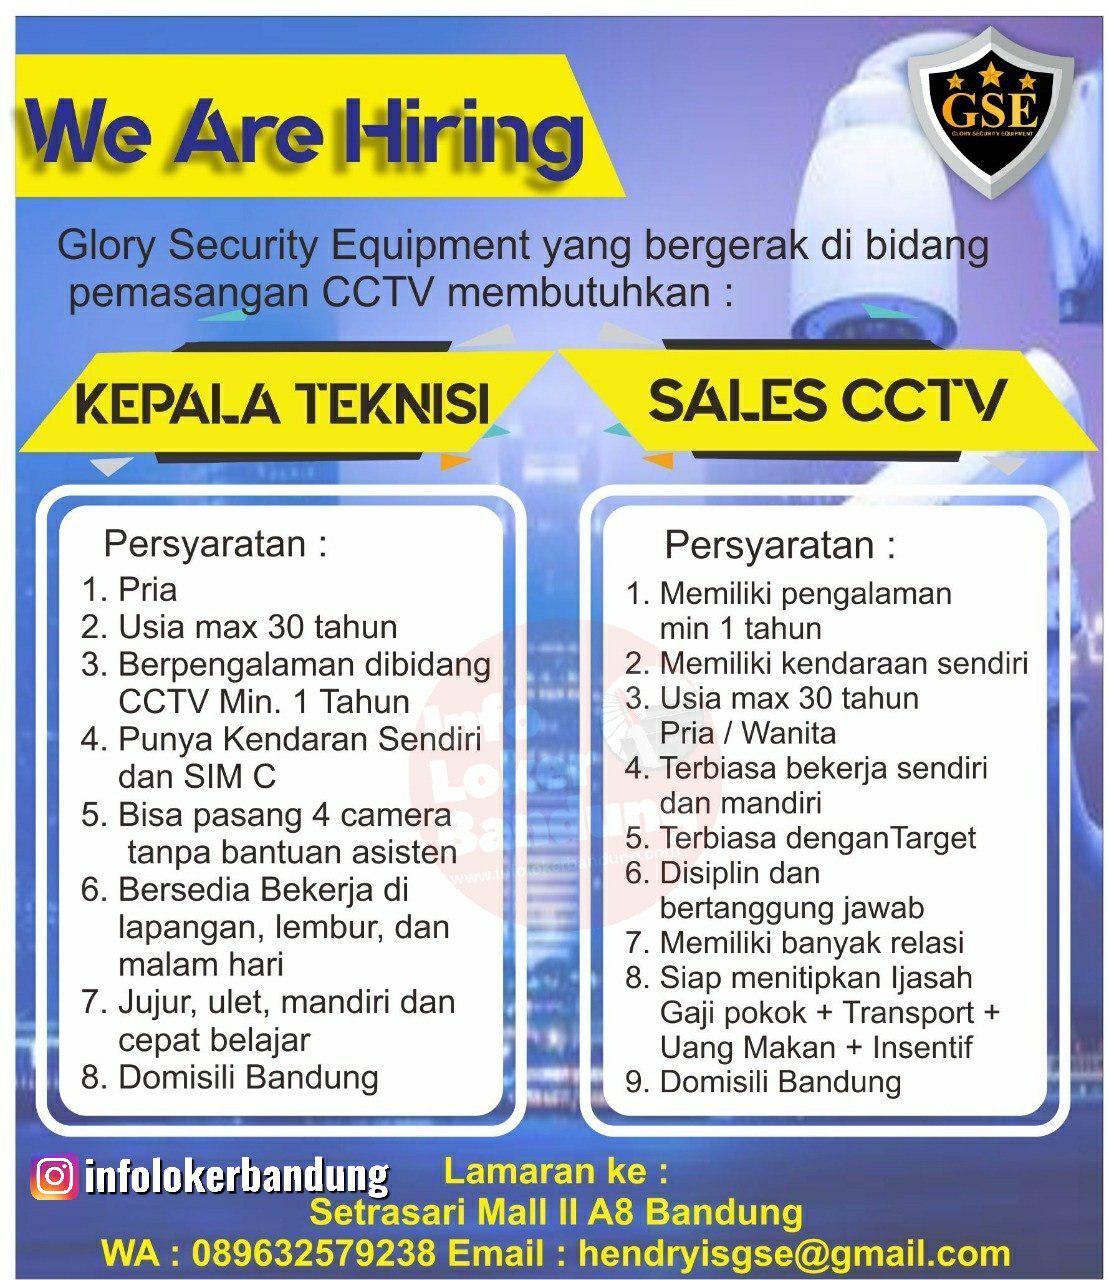 Lowongan Kerja Kepala Teknisi & Sales CCTV Glory Security Equipment (GSE) Bandung Juli 2019